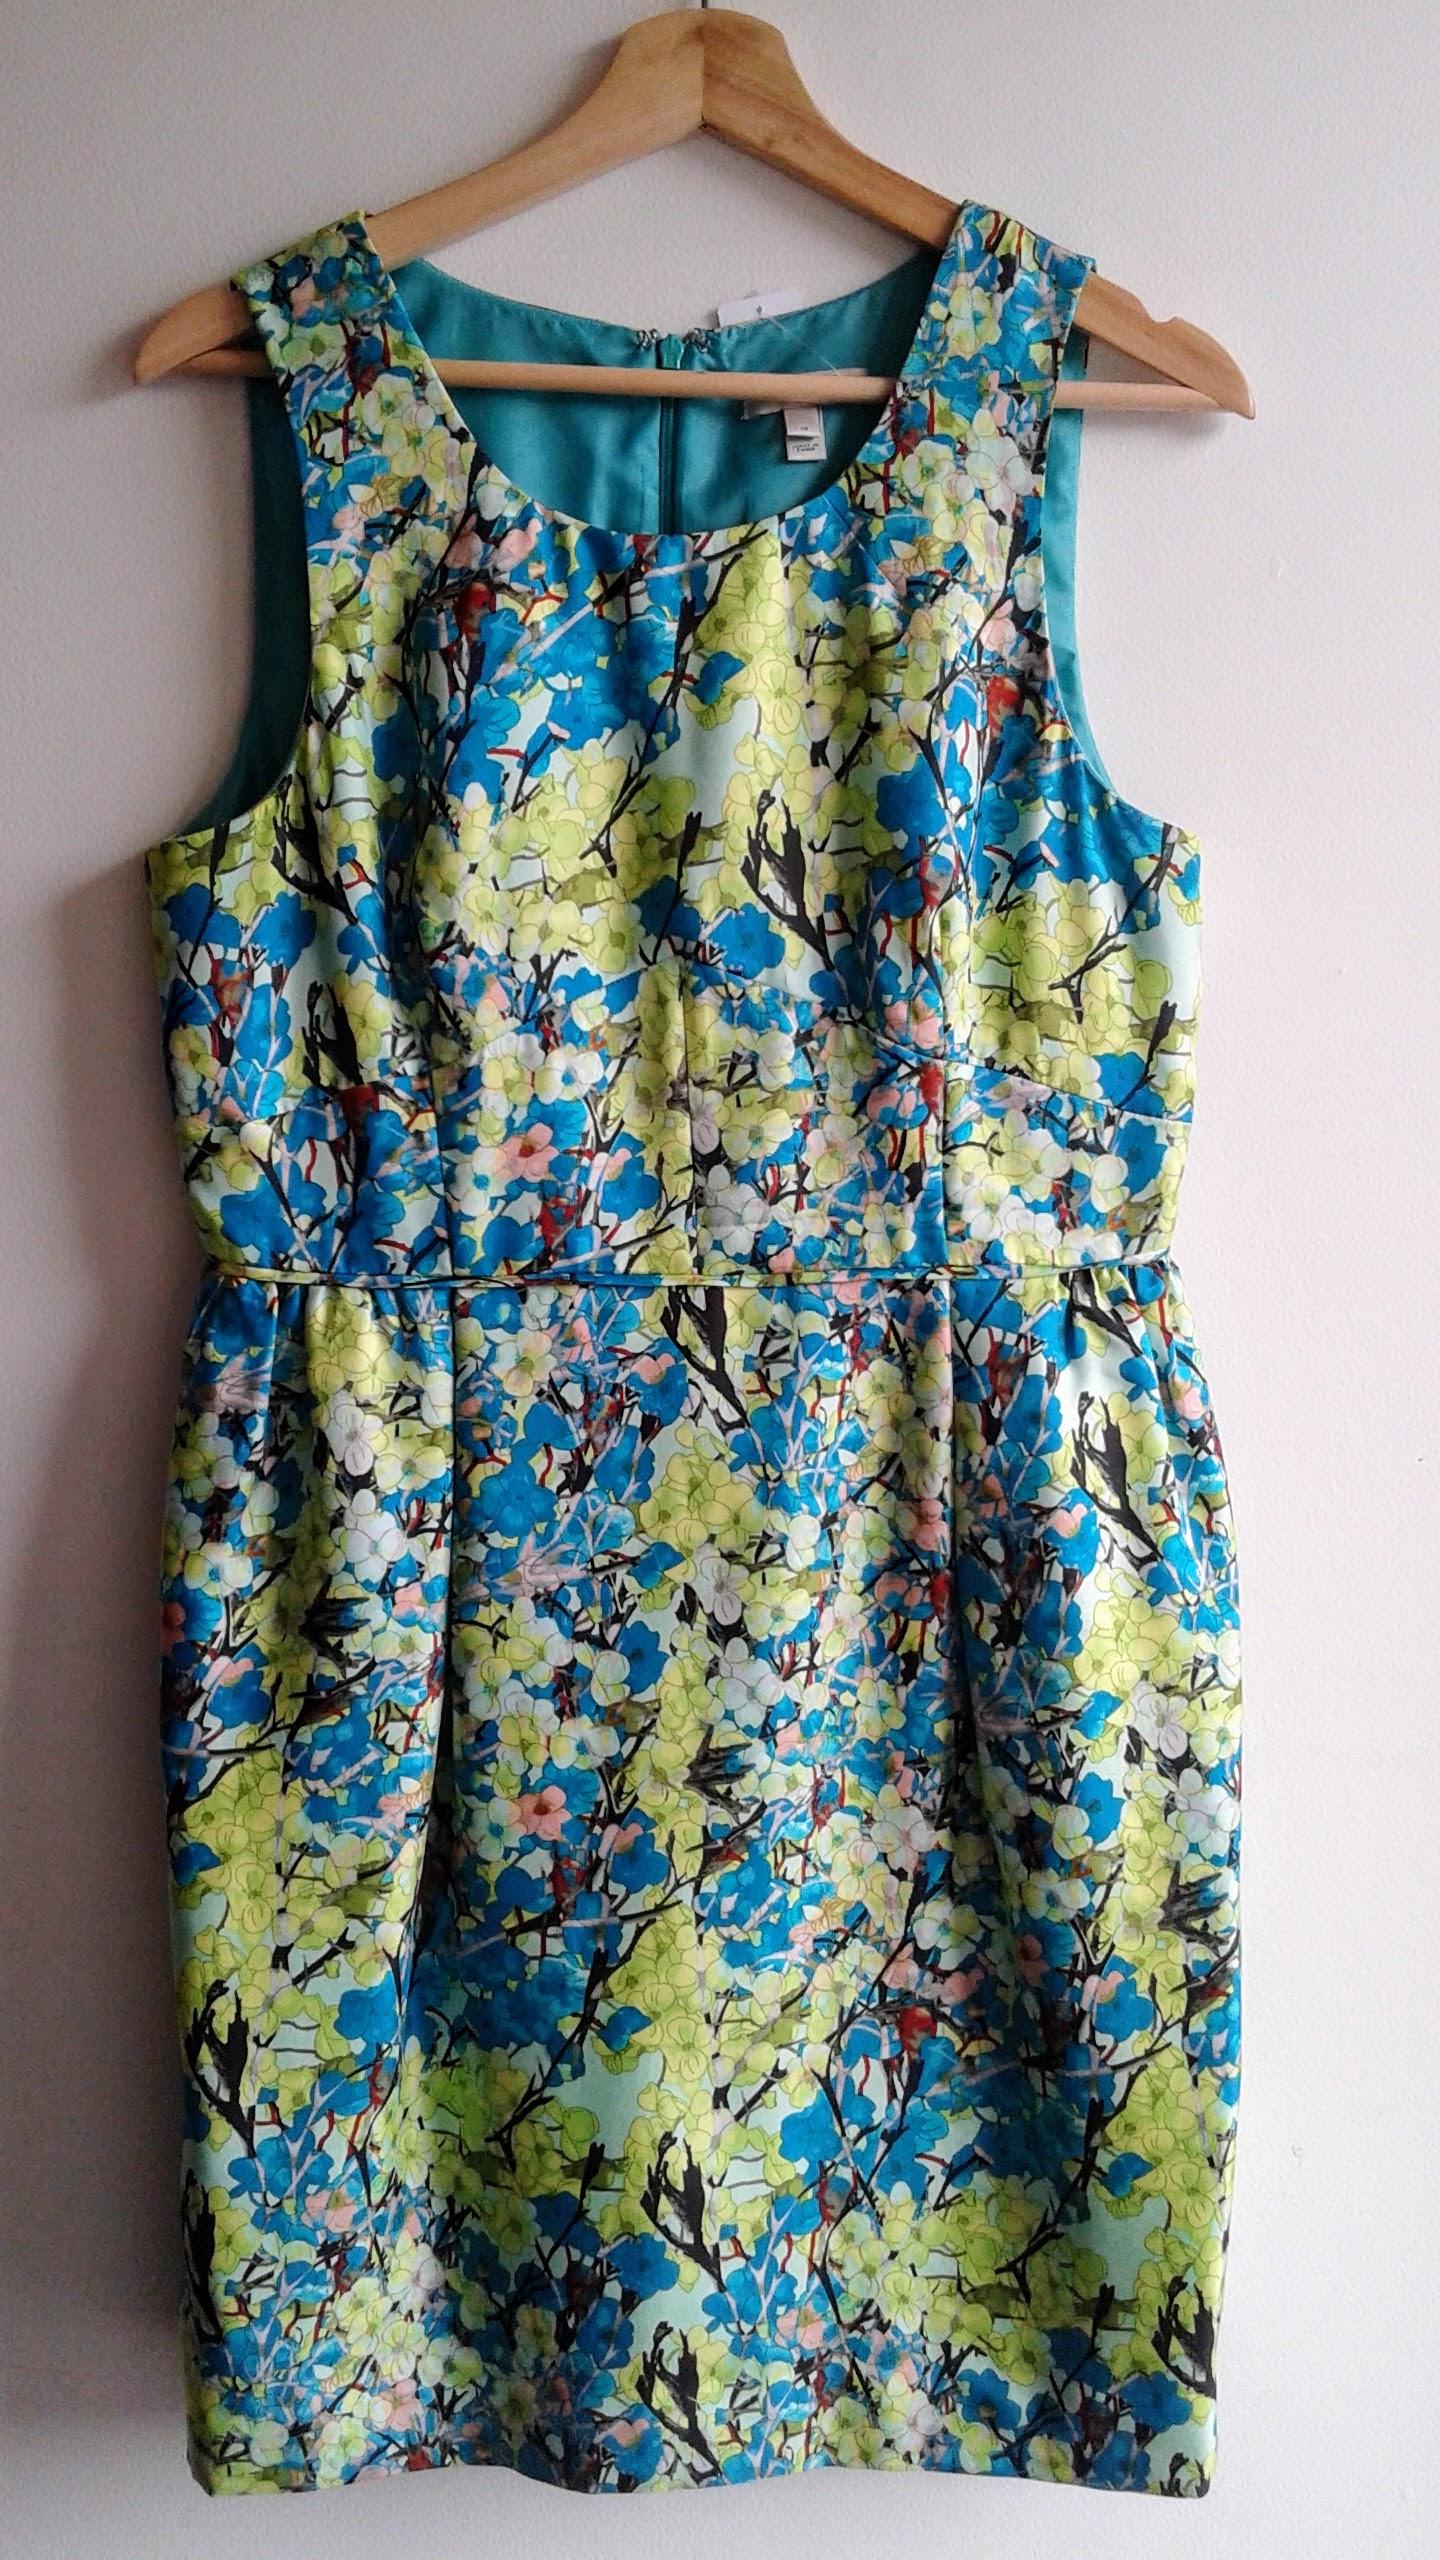 J Crew  dress; Size 10, $48